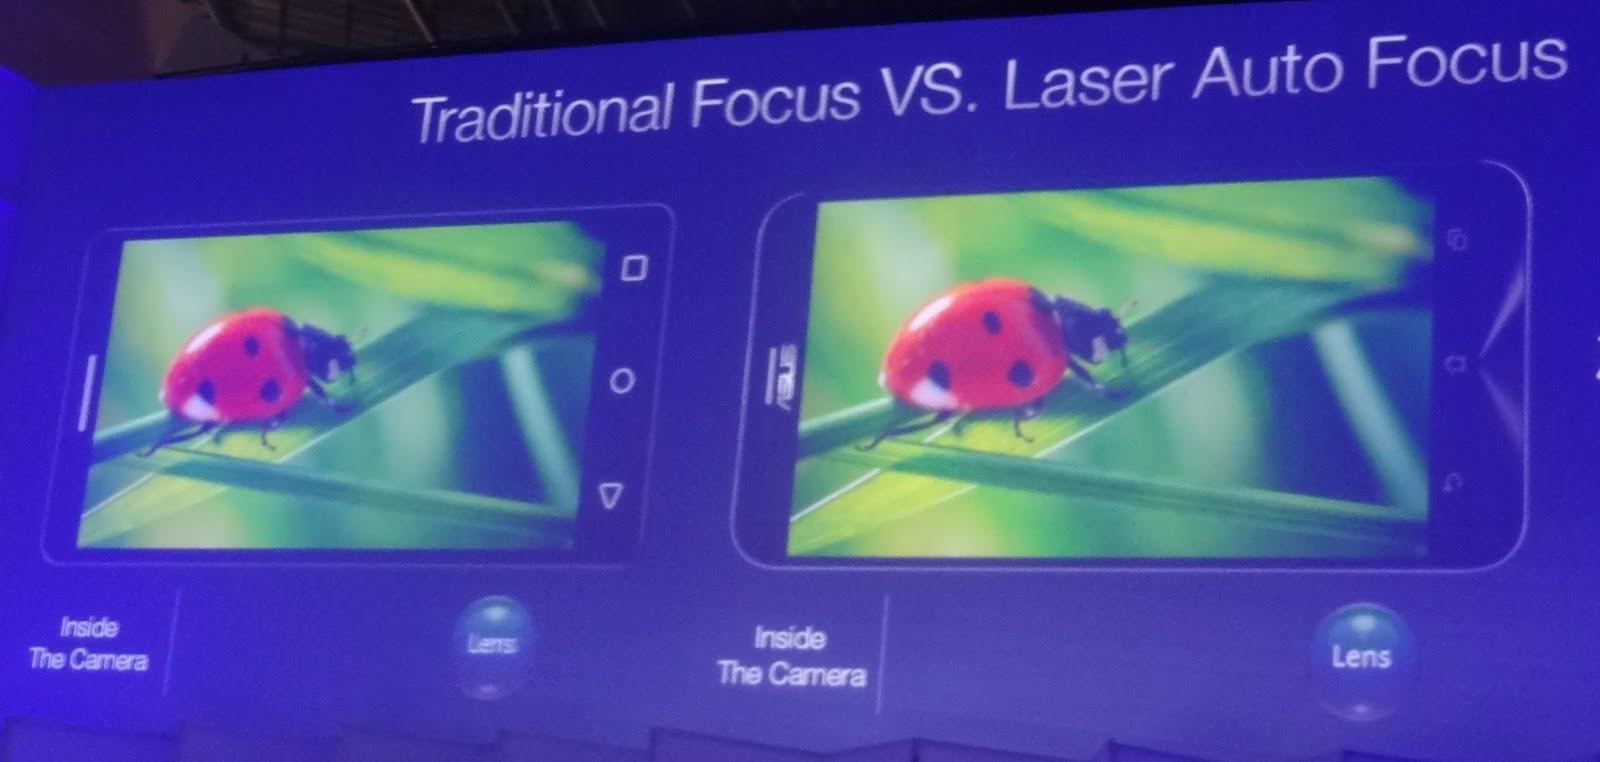 Asus Launches New Zenfone 2 Models At Zenfestival Delhi 2015 Laser Ze601kl Free Zenflash Auto Focus